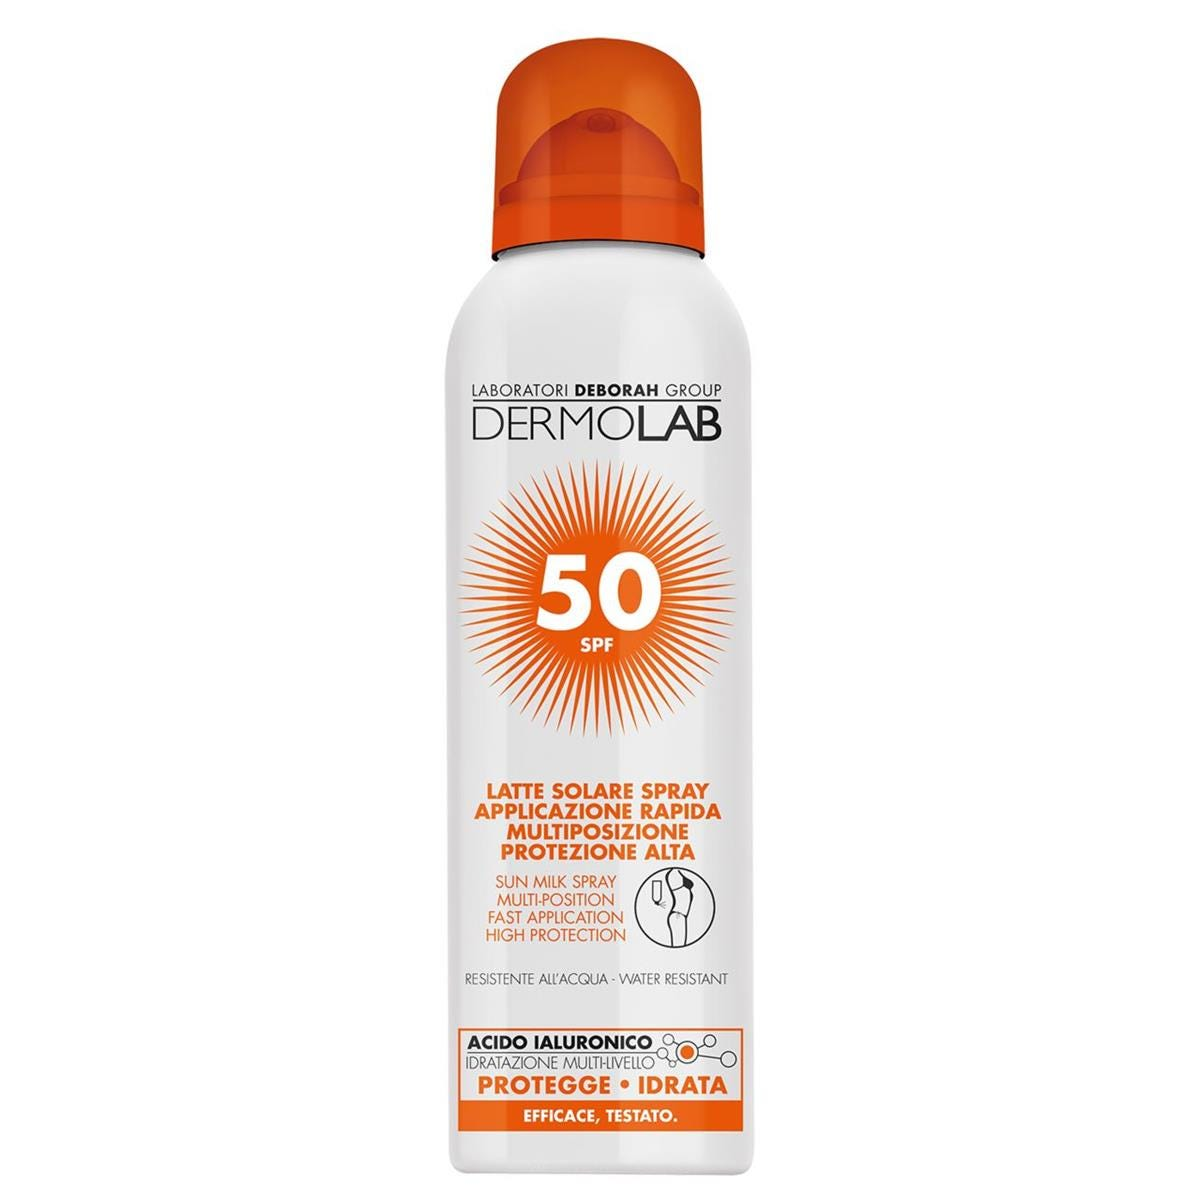 Image of Dermolab Latte Solare Spray 50 Spf - 150 ml